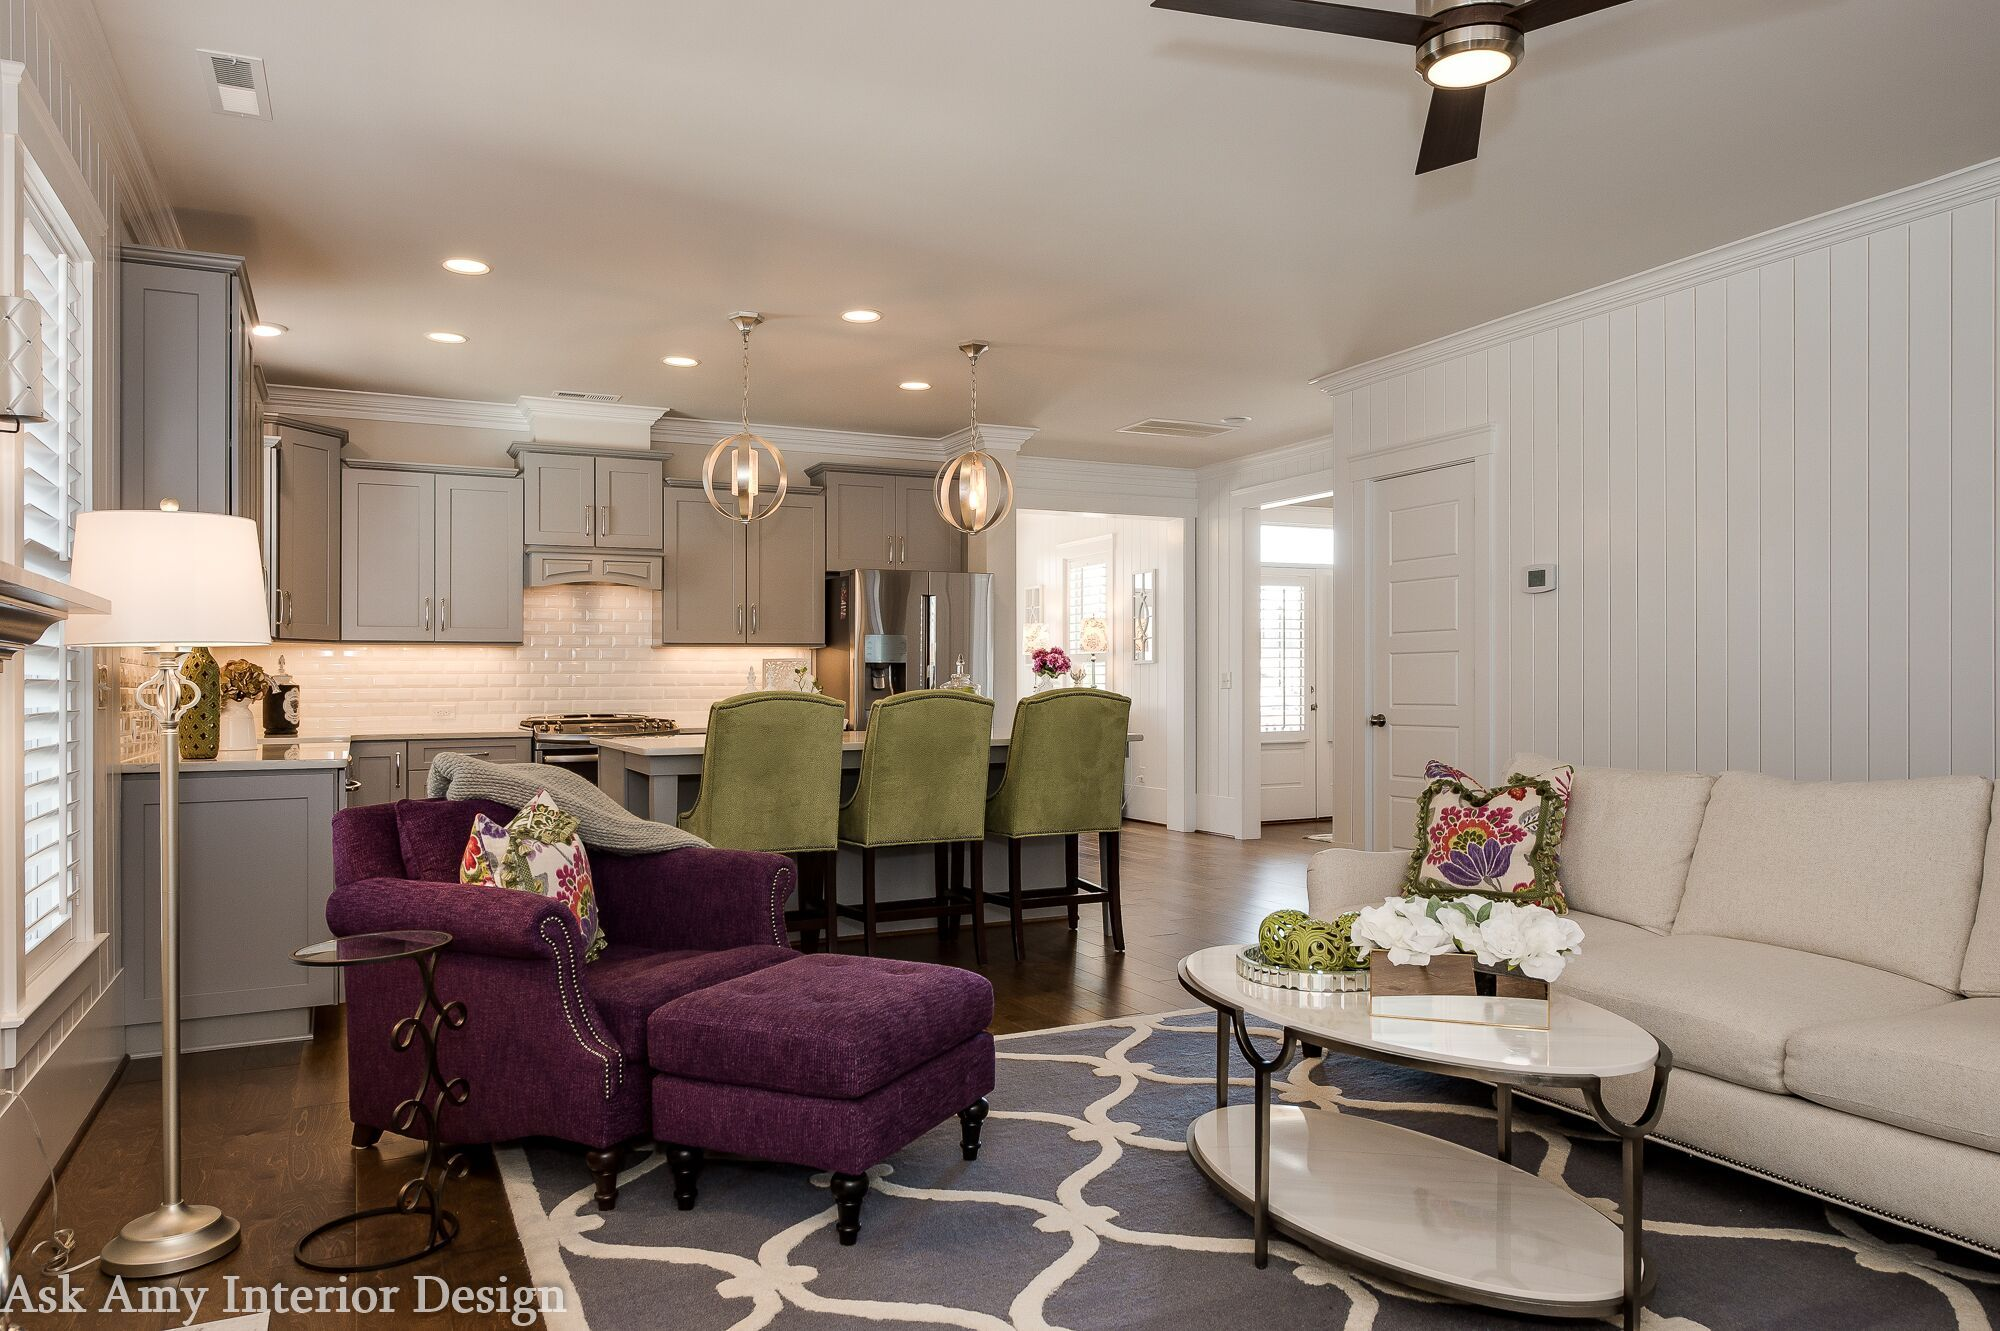 Interior designers charlotte nc interior design firms charlotte nc residential interior design charlotte